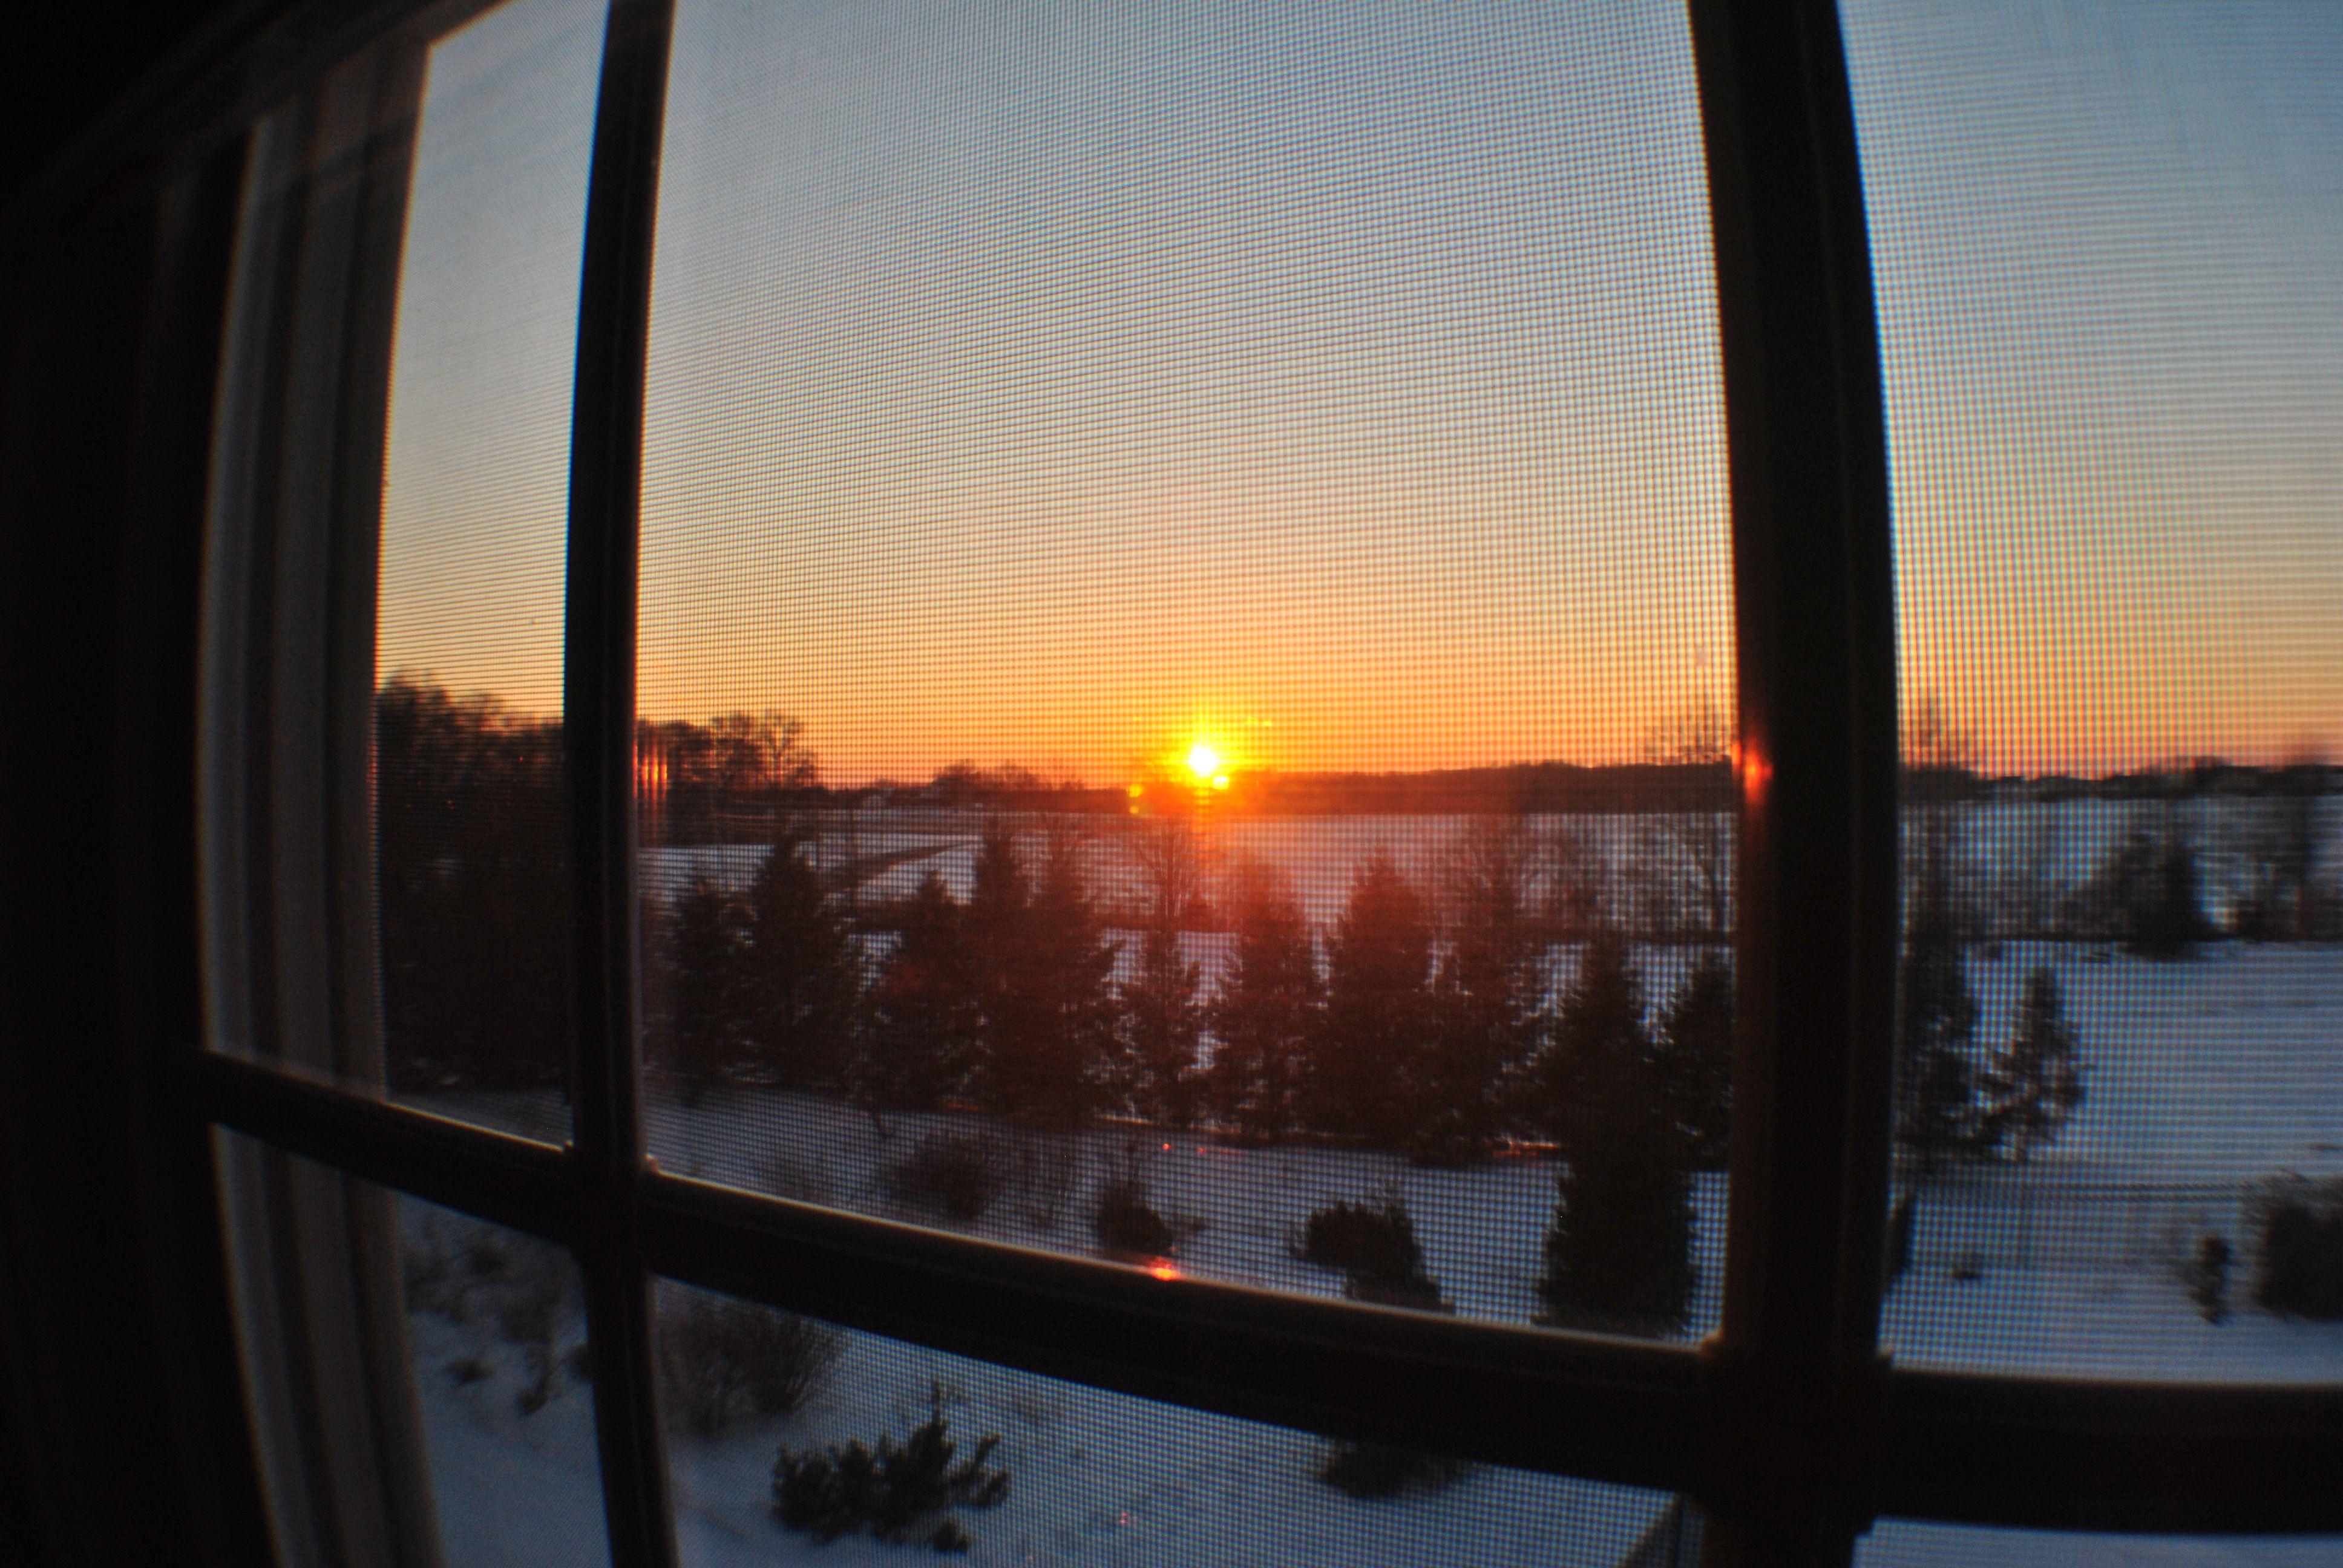 Sunset, New Jersey.